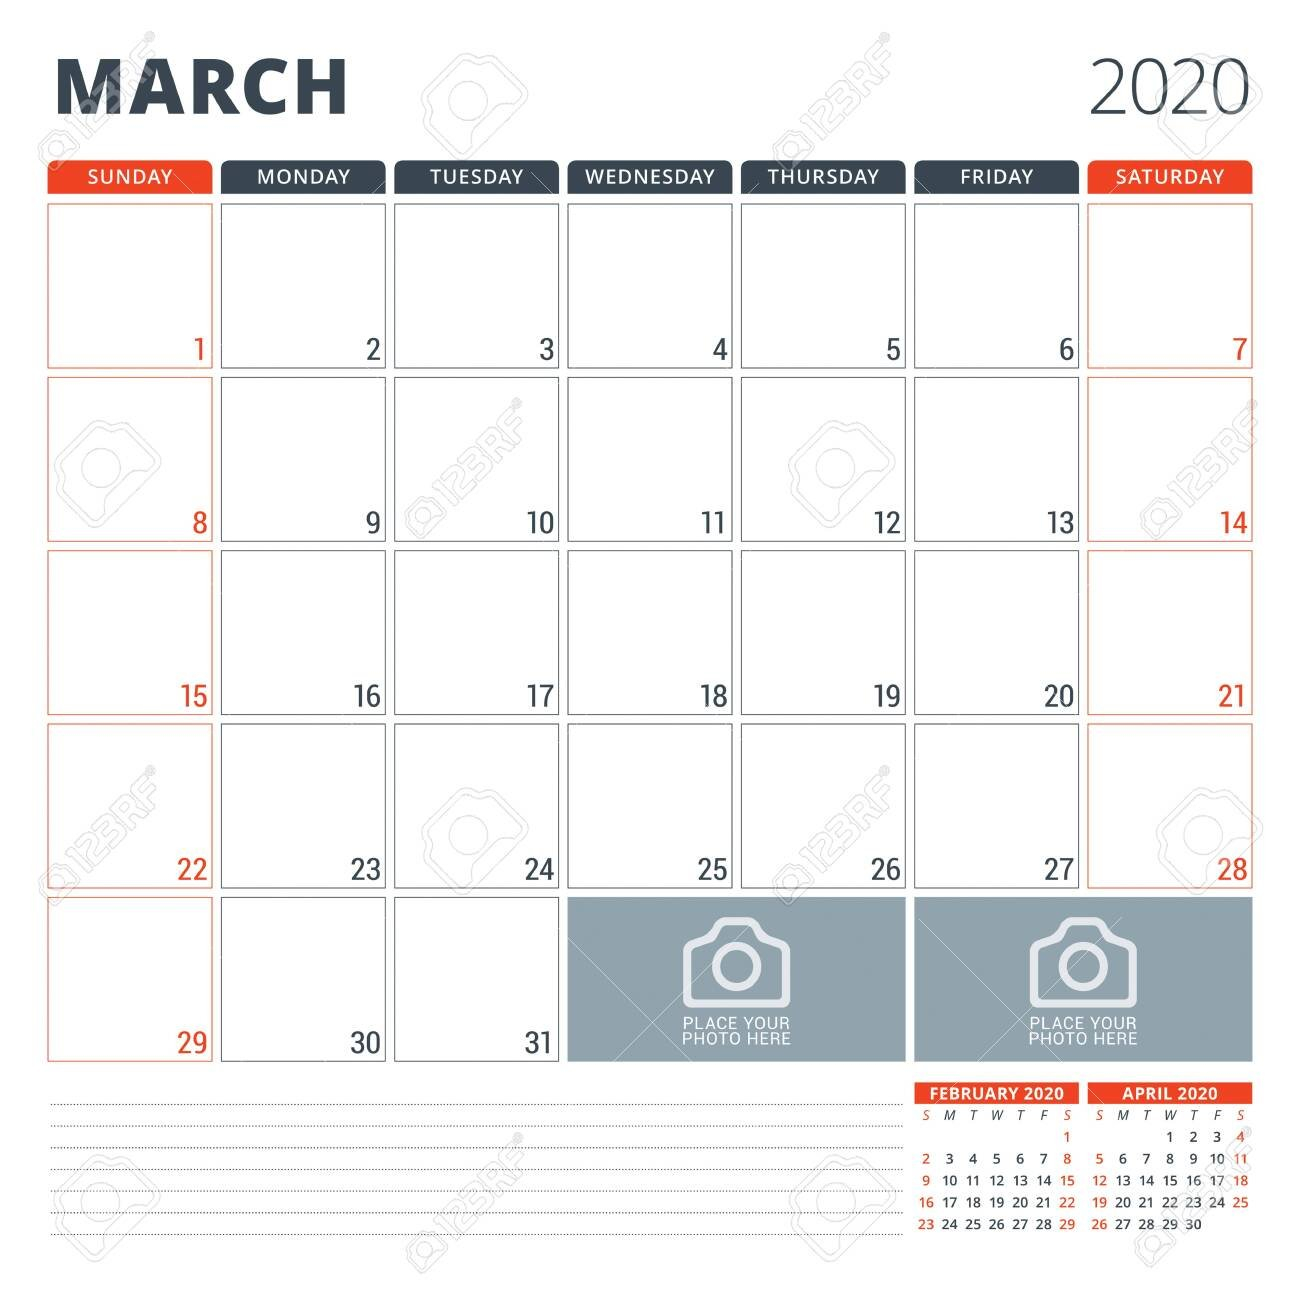 Calendar Planner For 2020. Stationery Design Template. Week Starts.. Monday Through Friday 8-5 Calendar